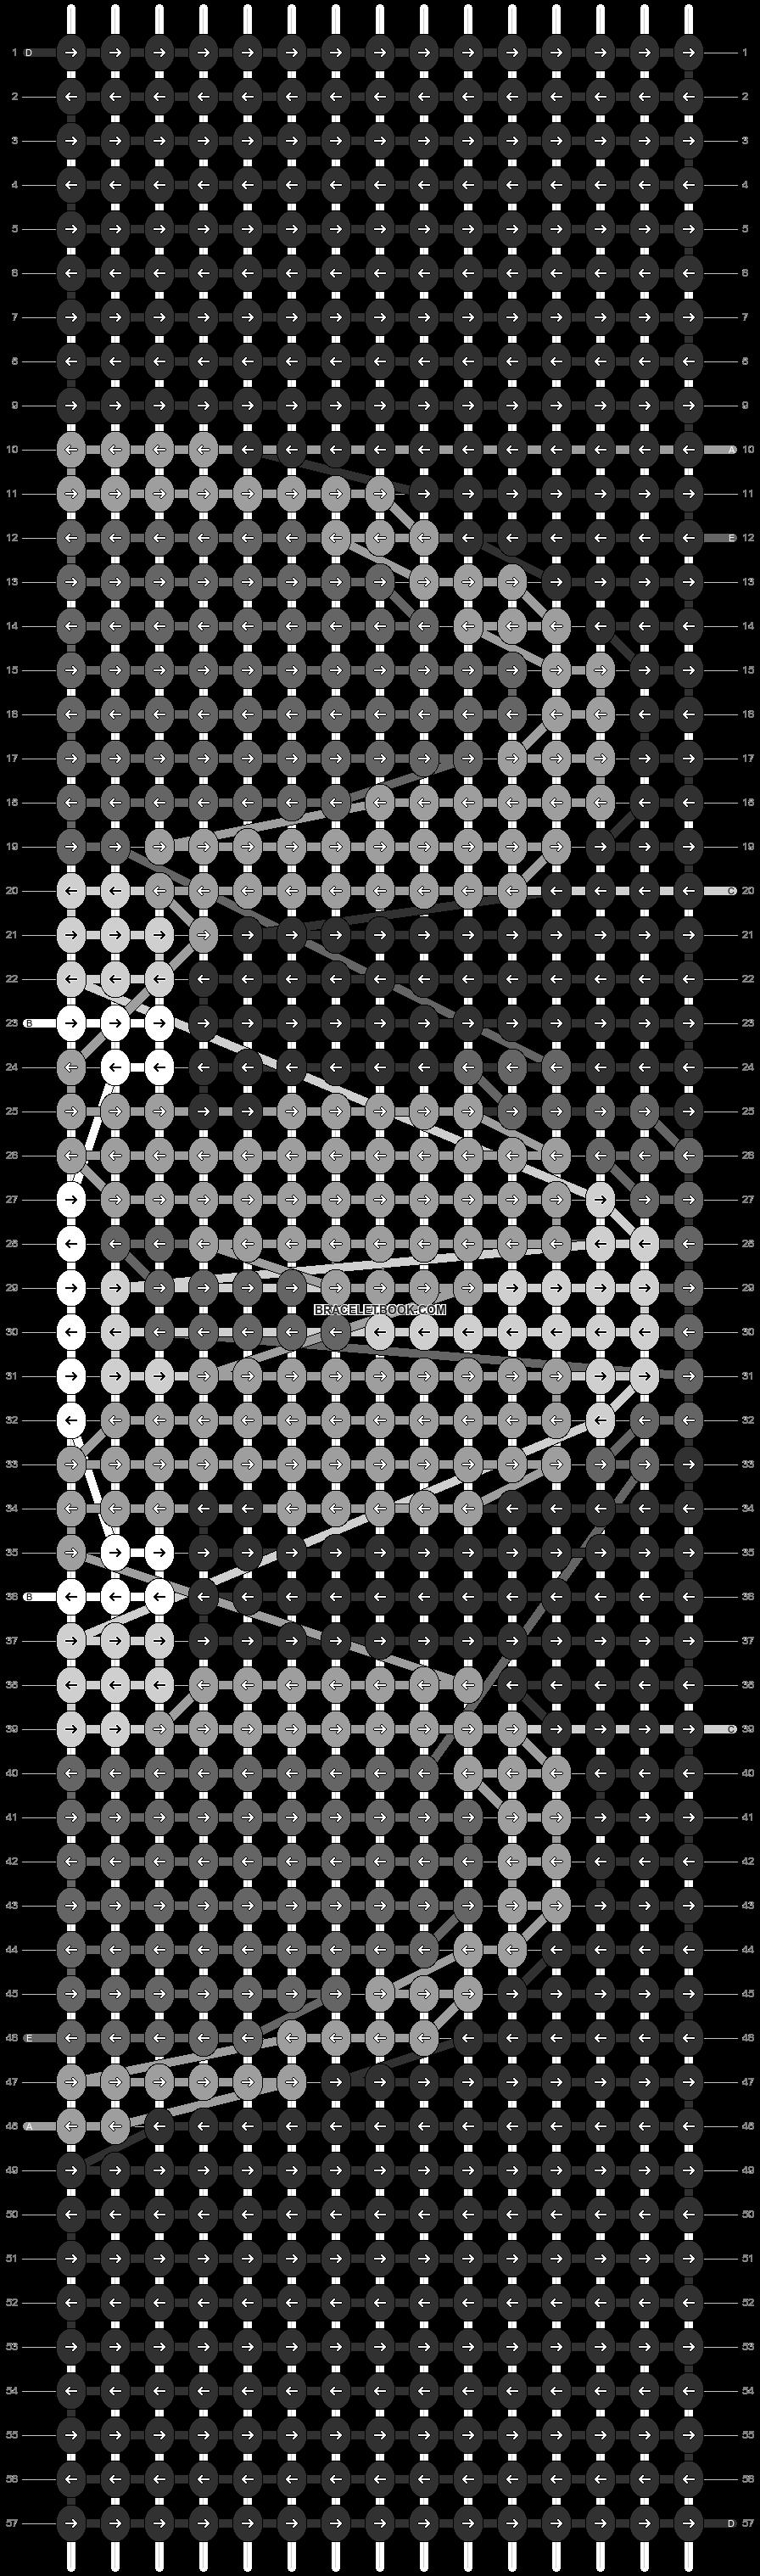 Alpha pattern #79813 pattern